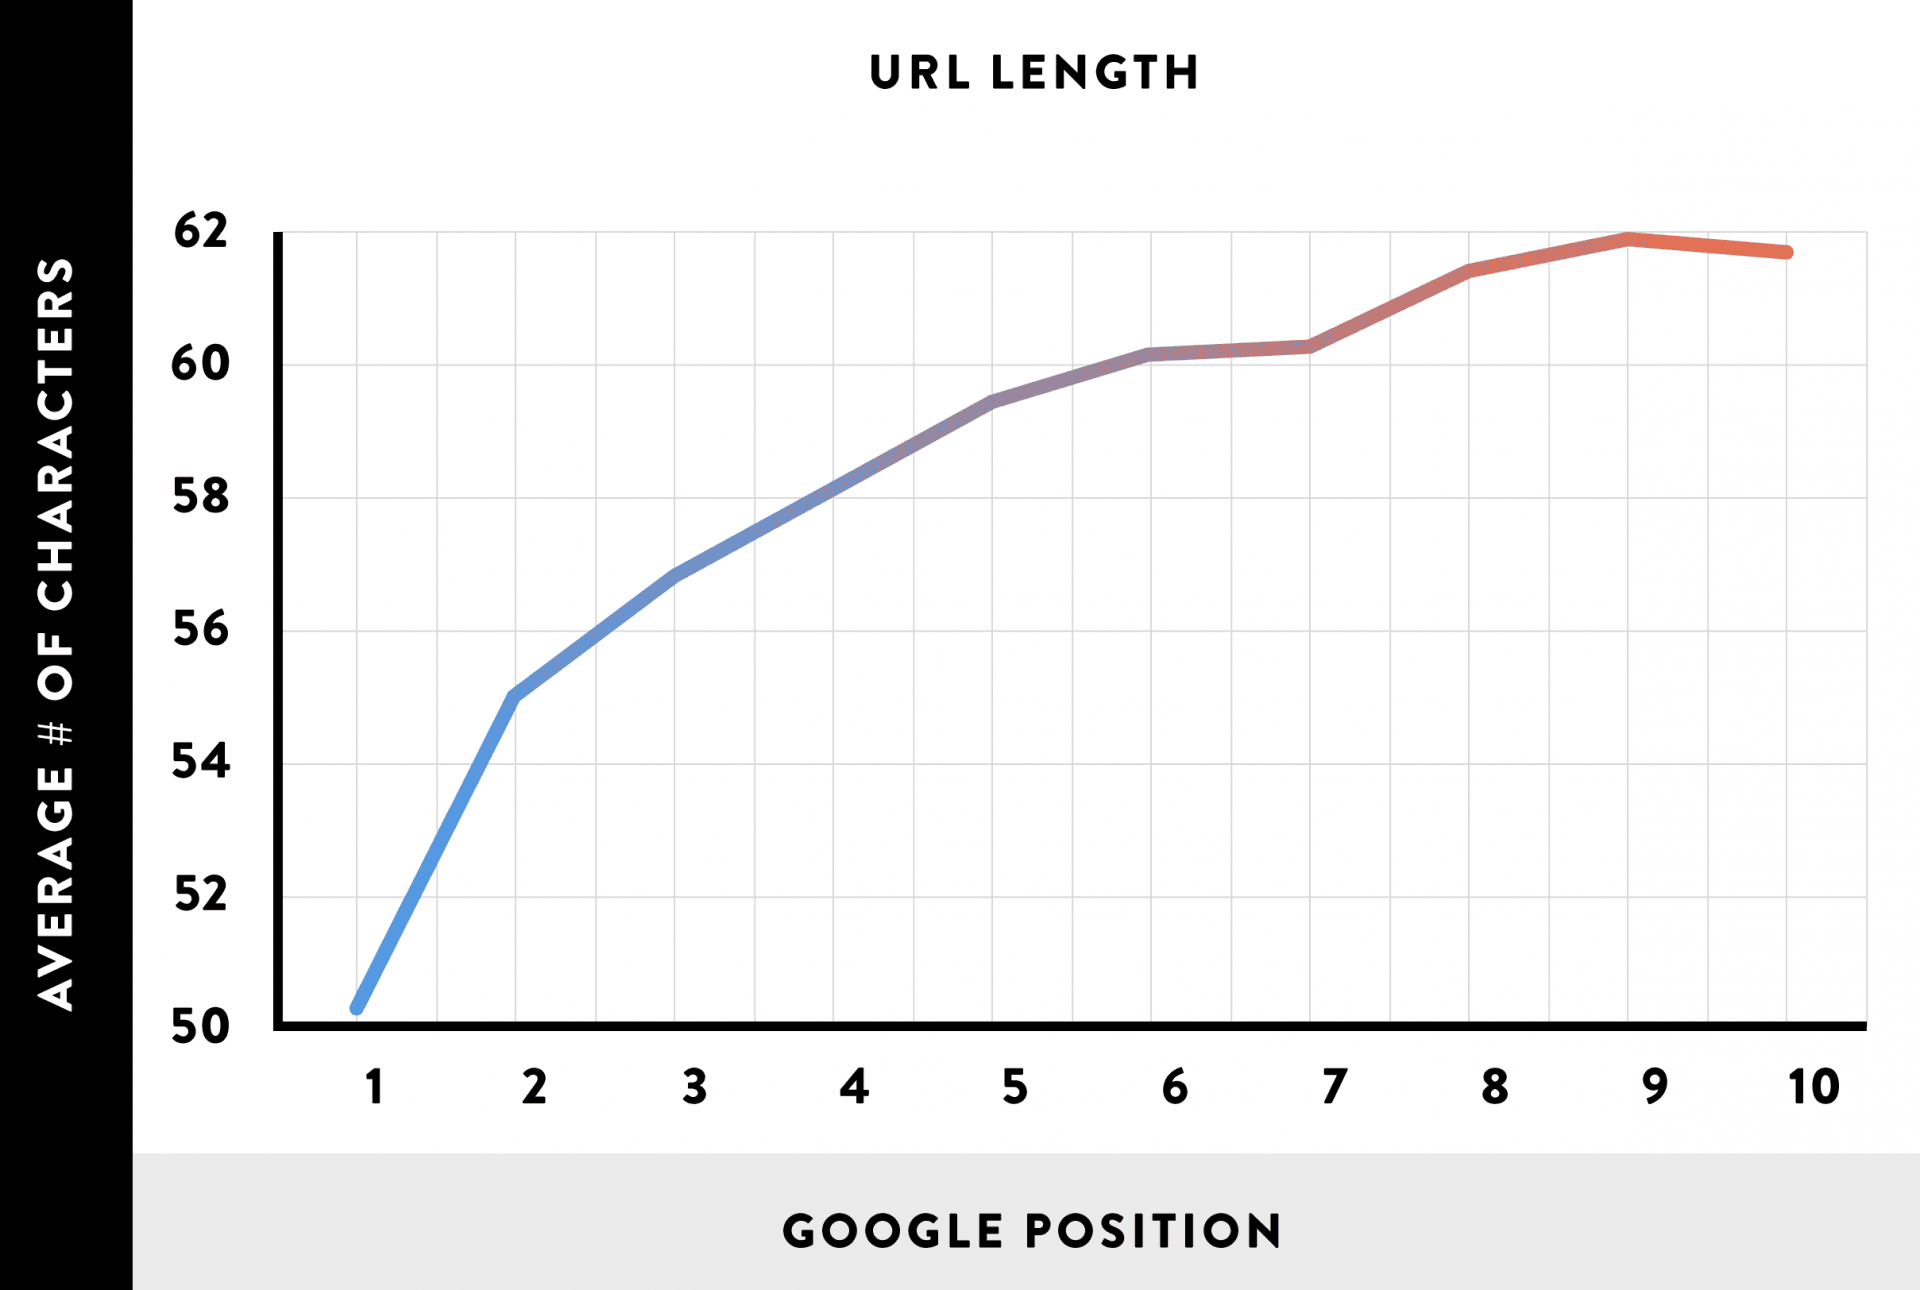 Google Position relative the URL length